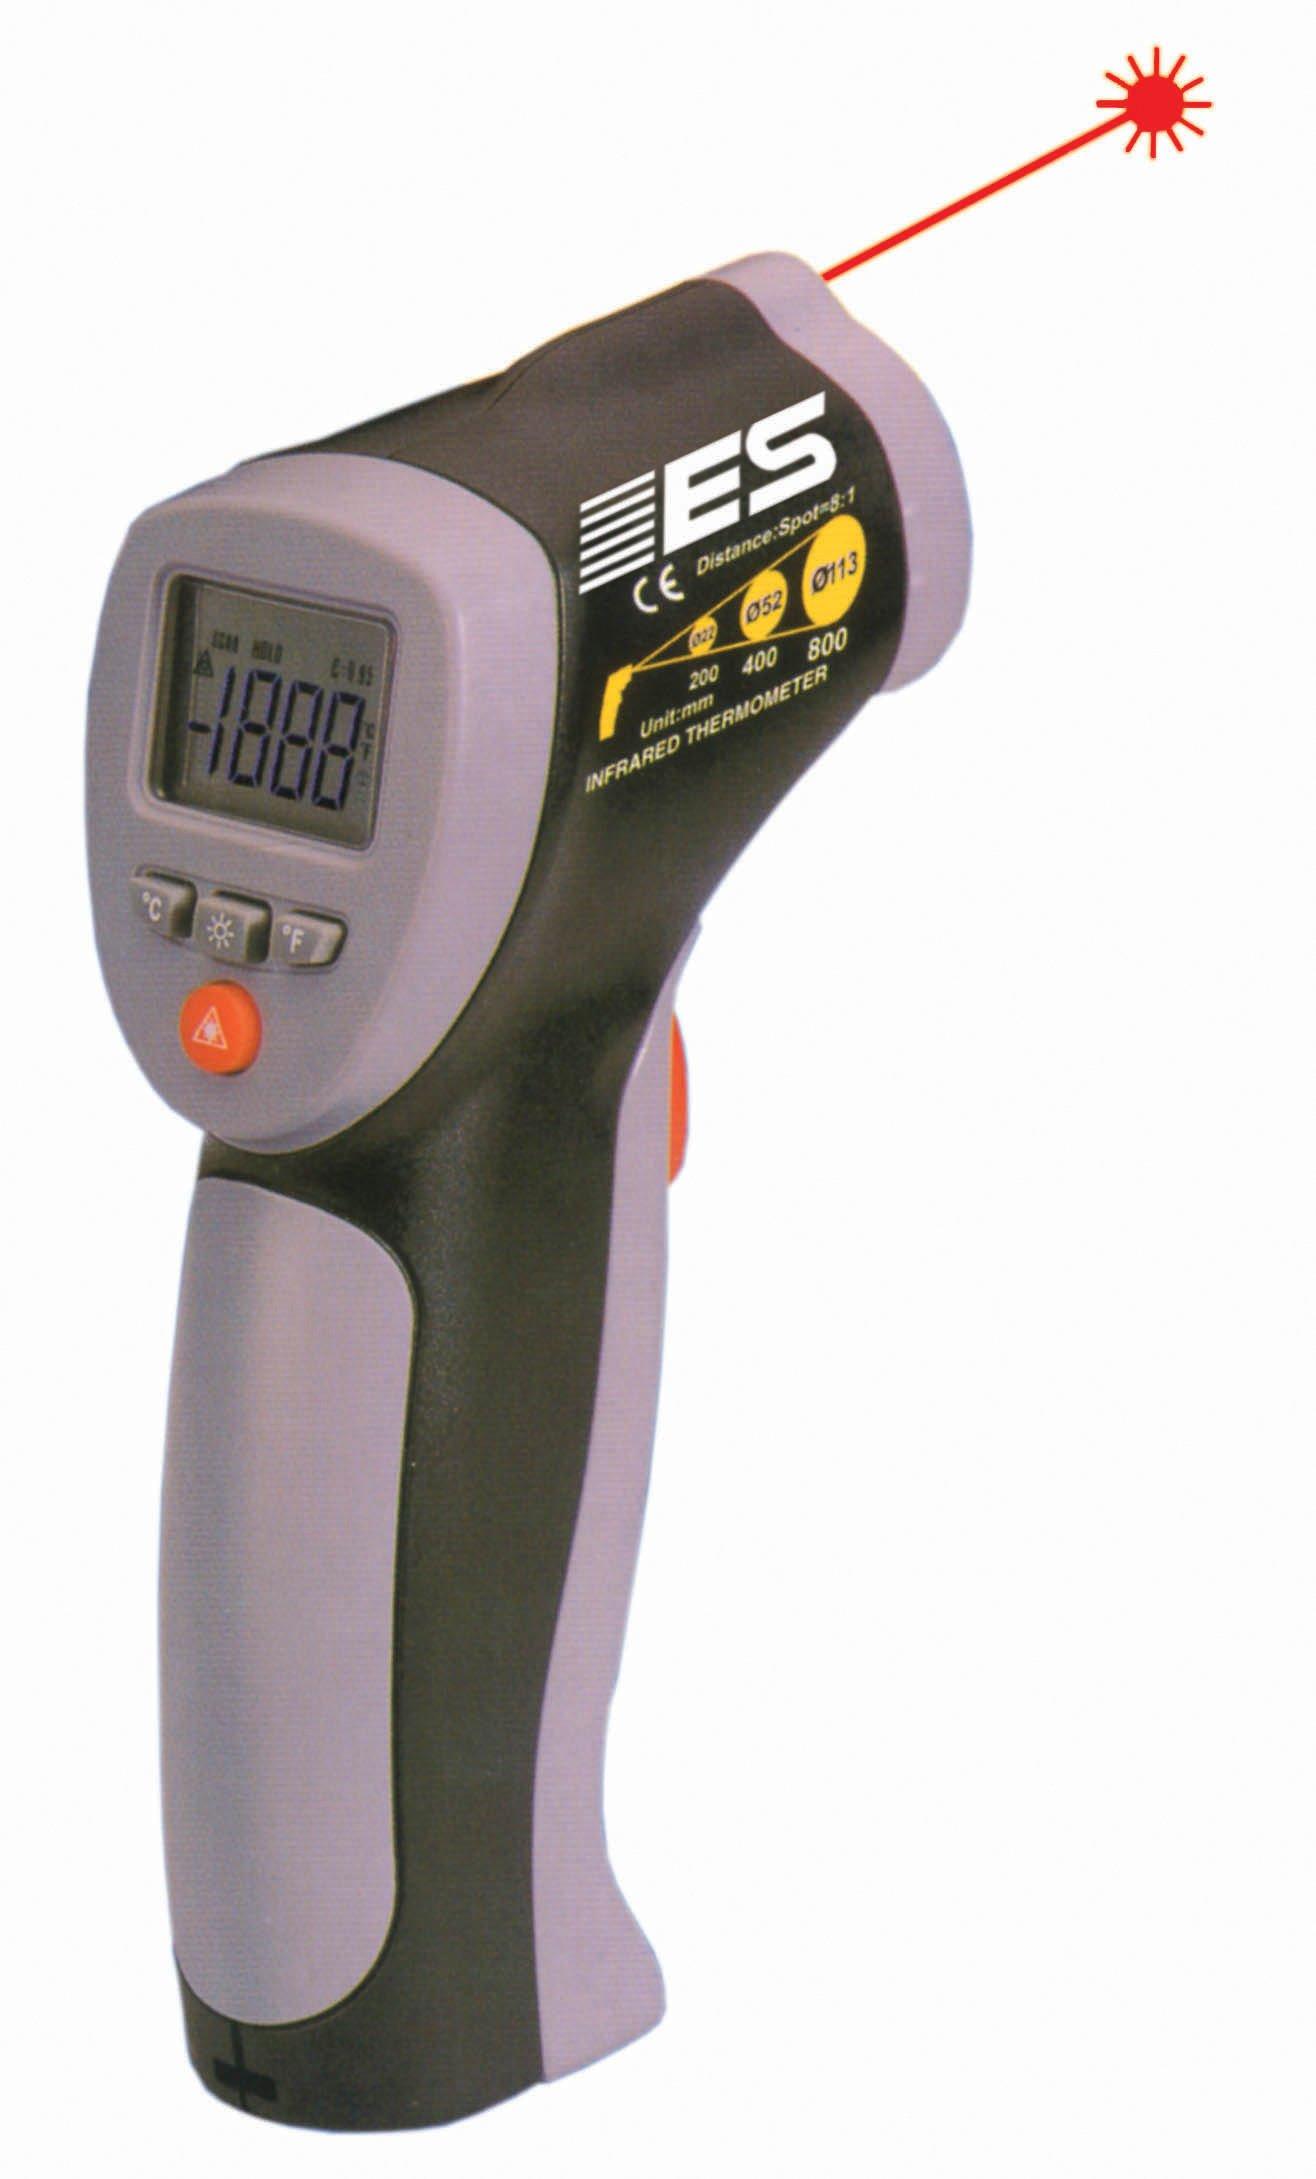 Electronic Specialties EST-65 Non-Contact IR Thermometer by Electronic Specialties (Image #1)